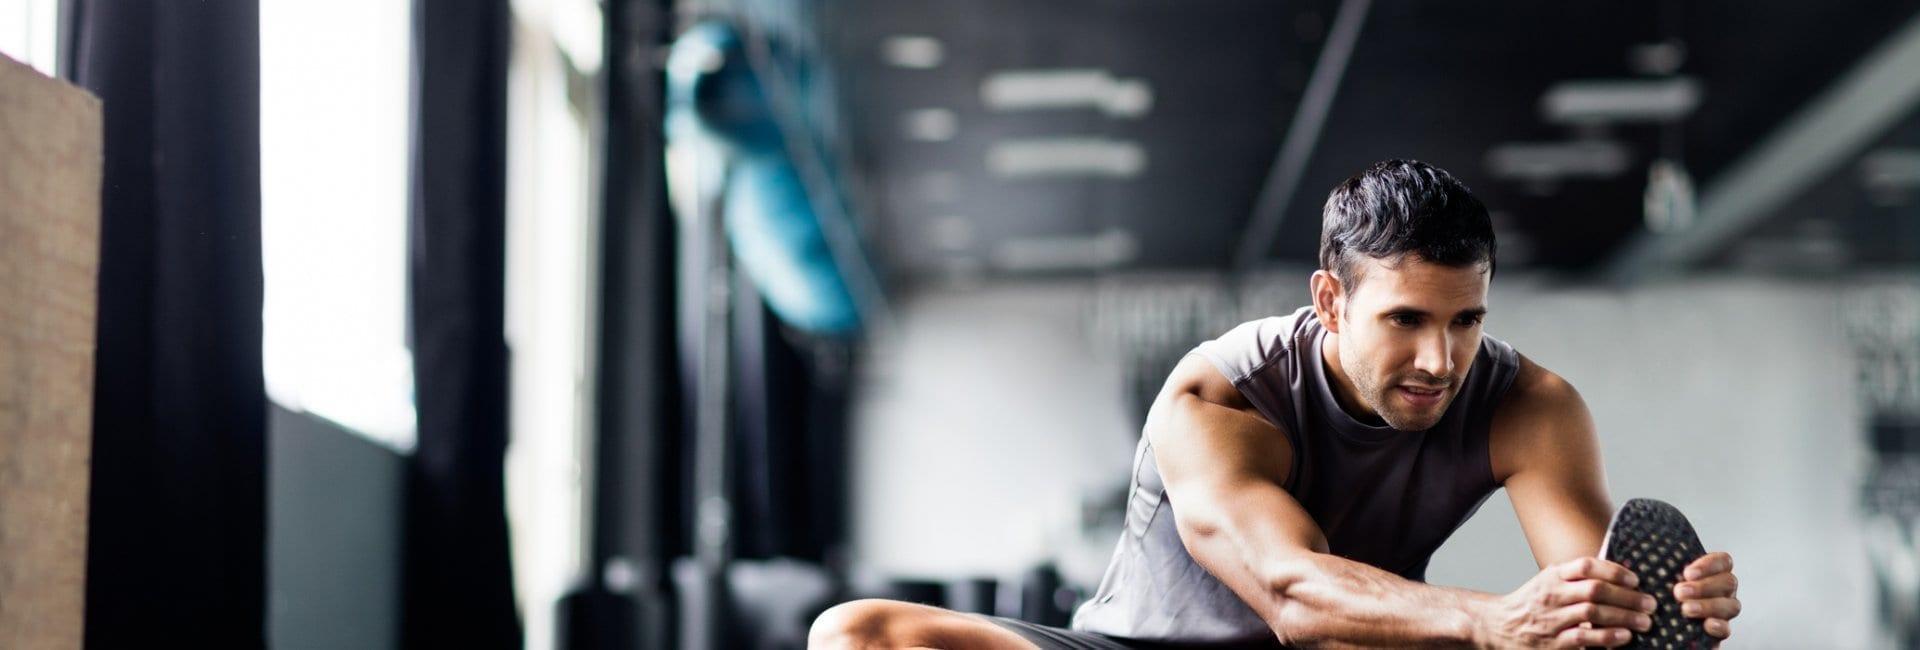 Man stretching in gym